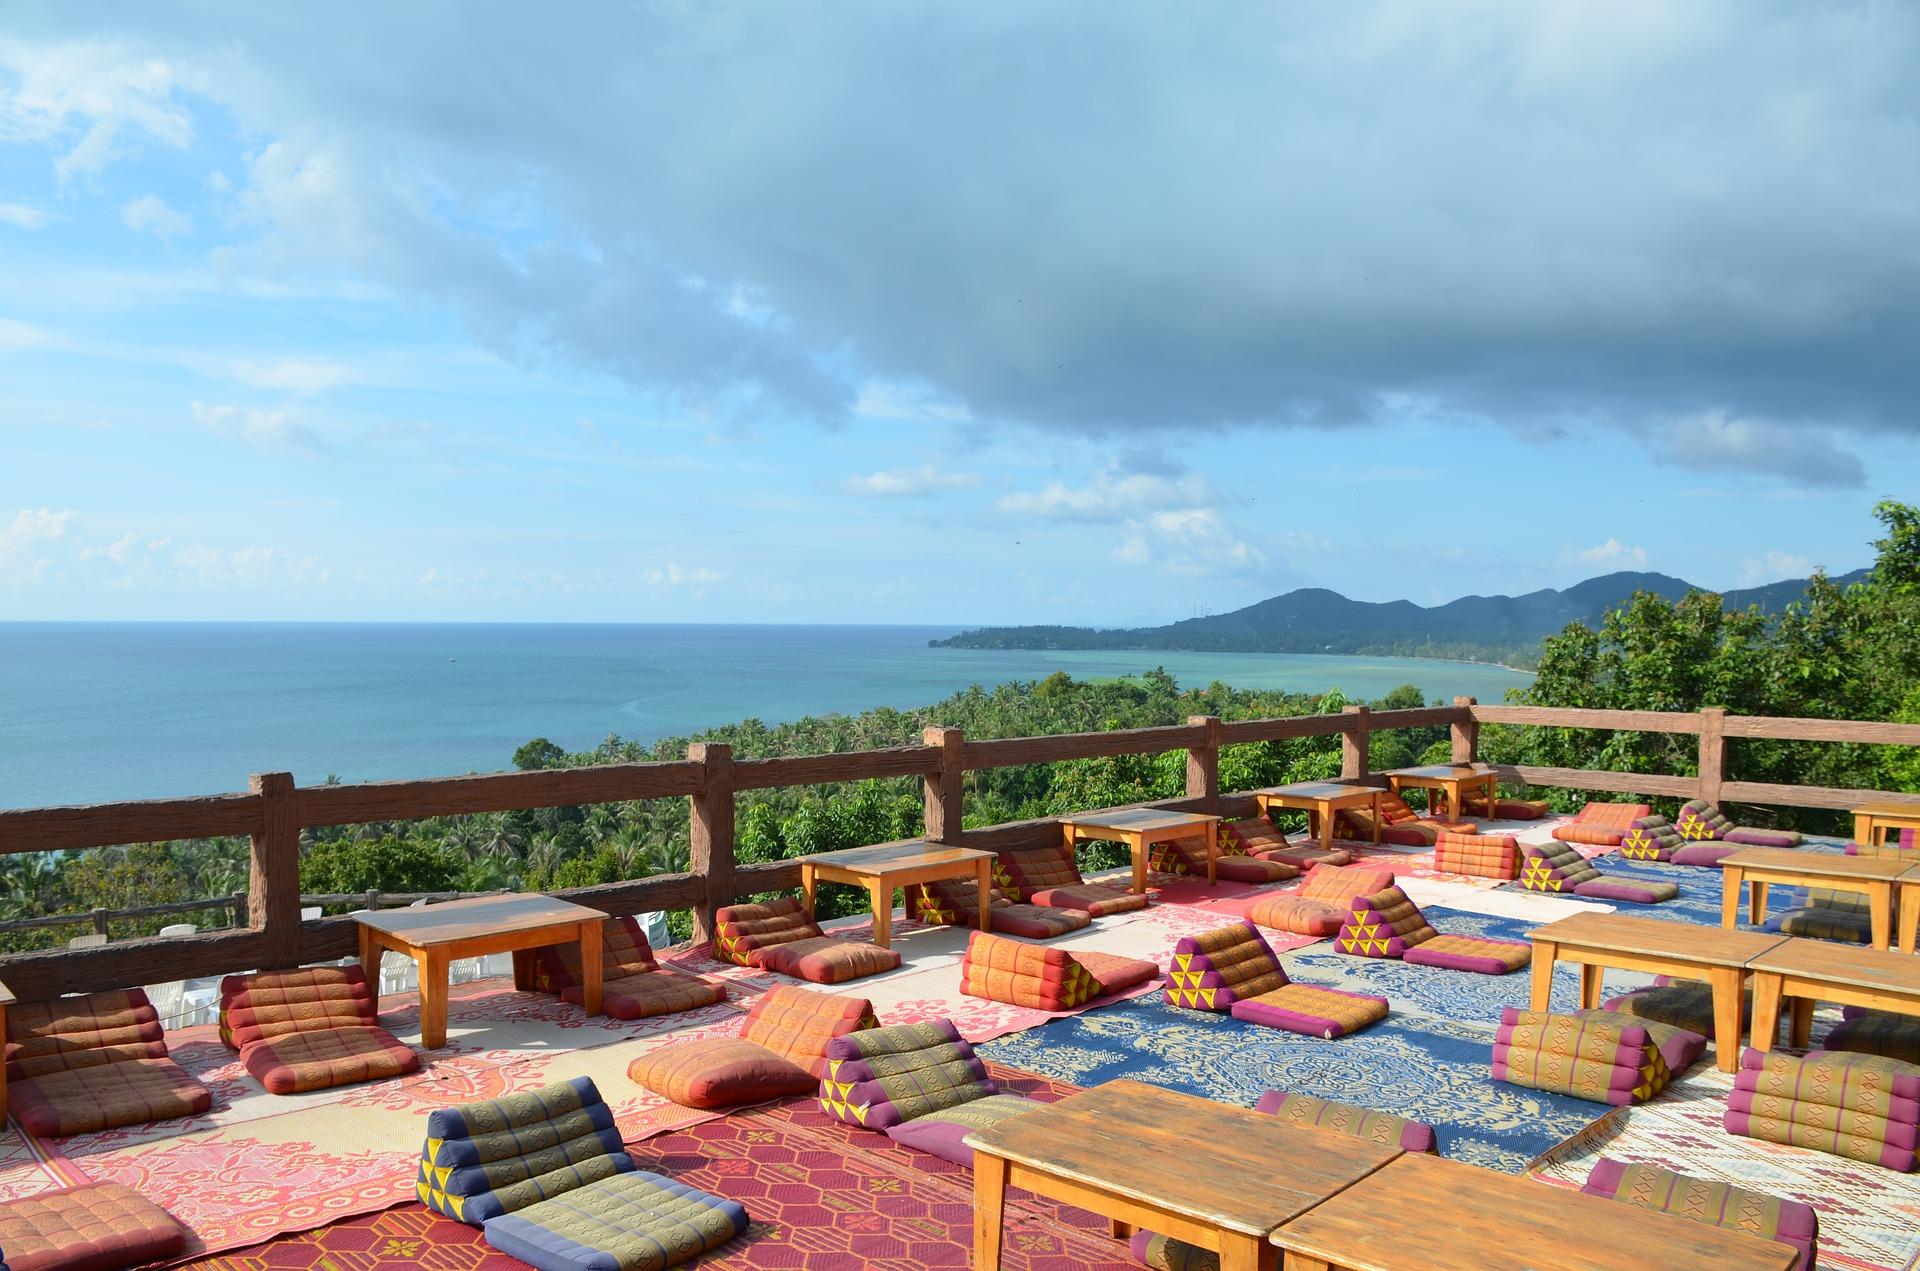 Koh Phangan Bungalow am Ban Tai Beach günsitg ab 7,50€ die Nacht